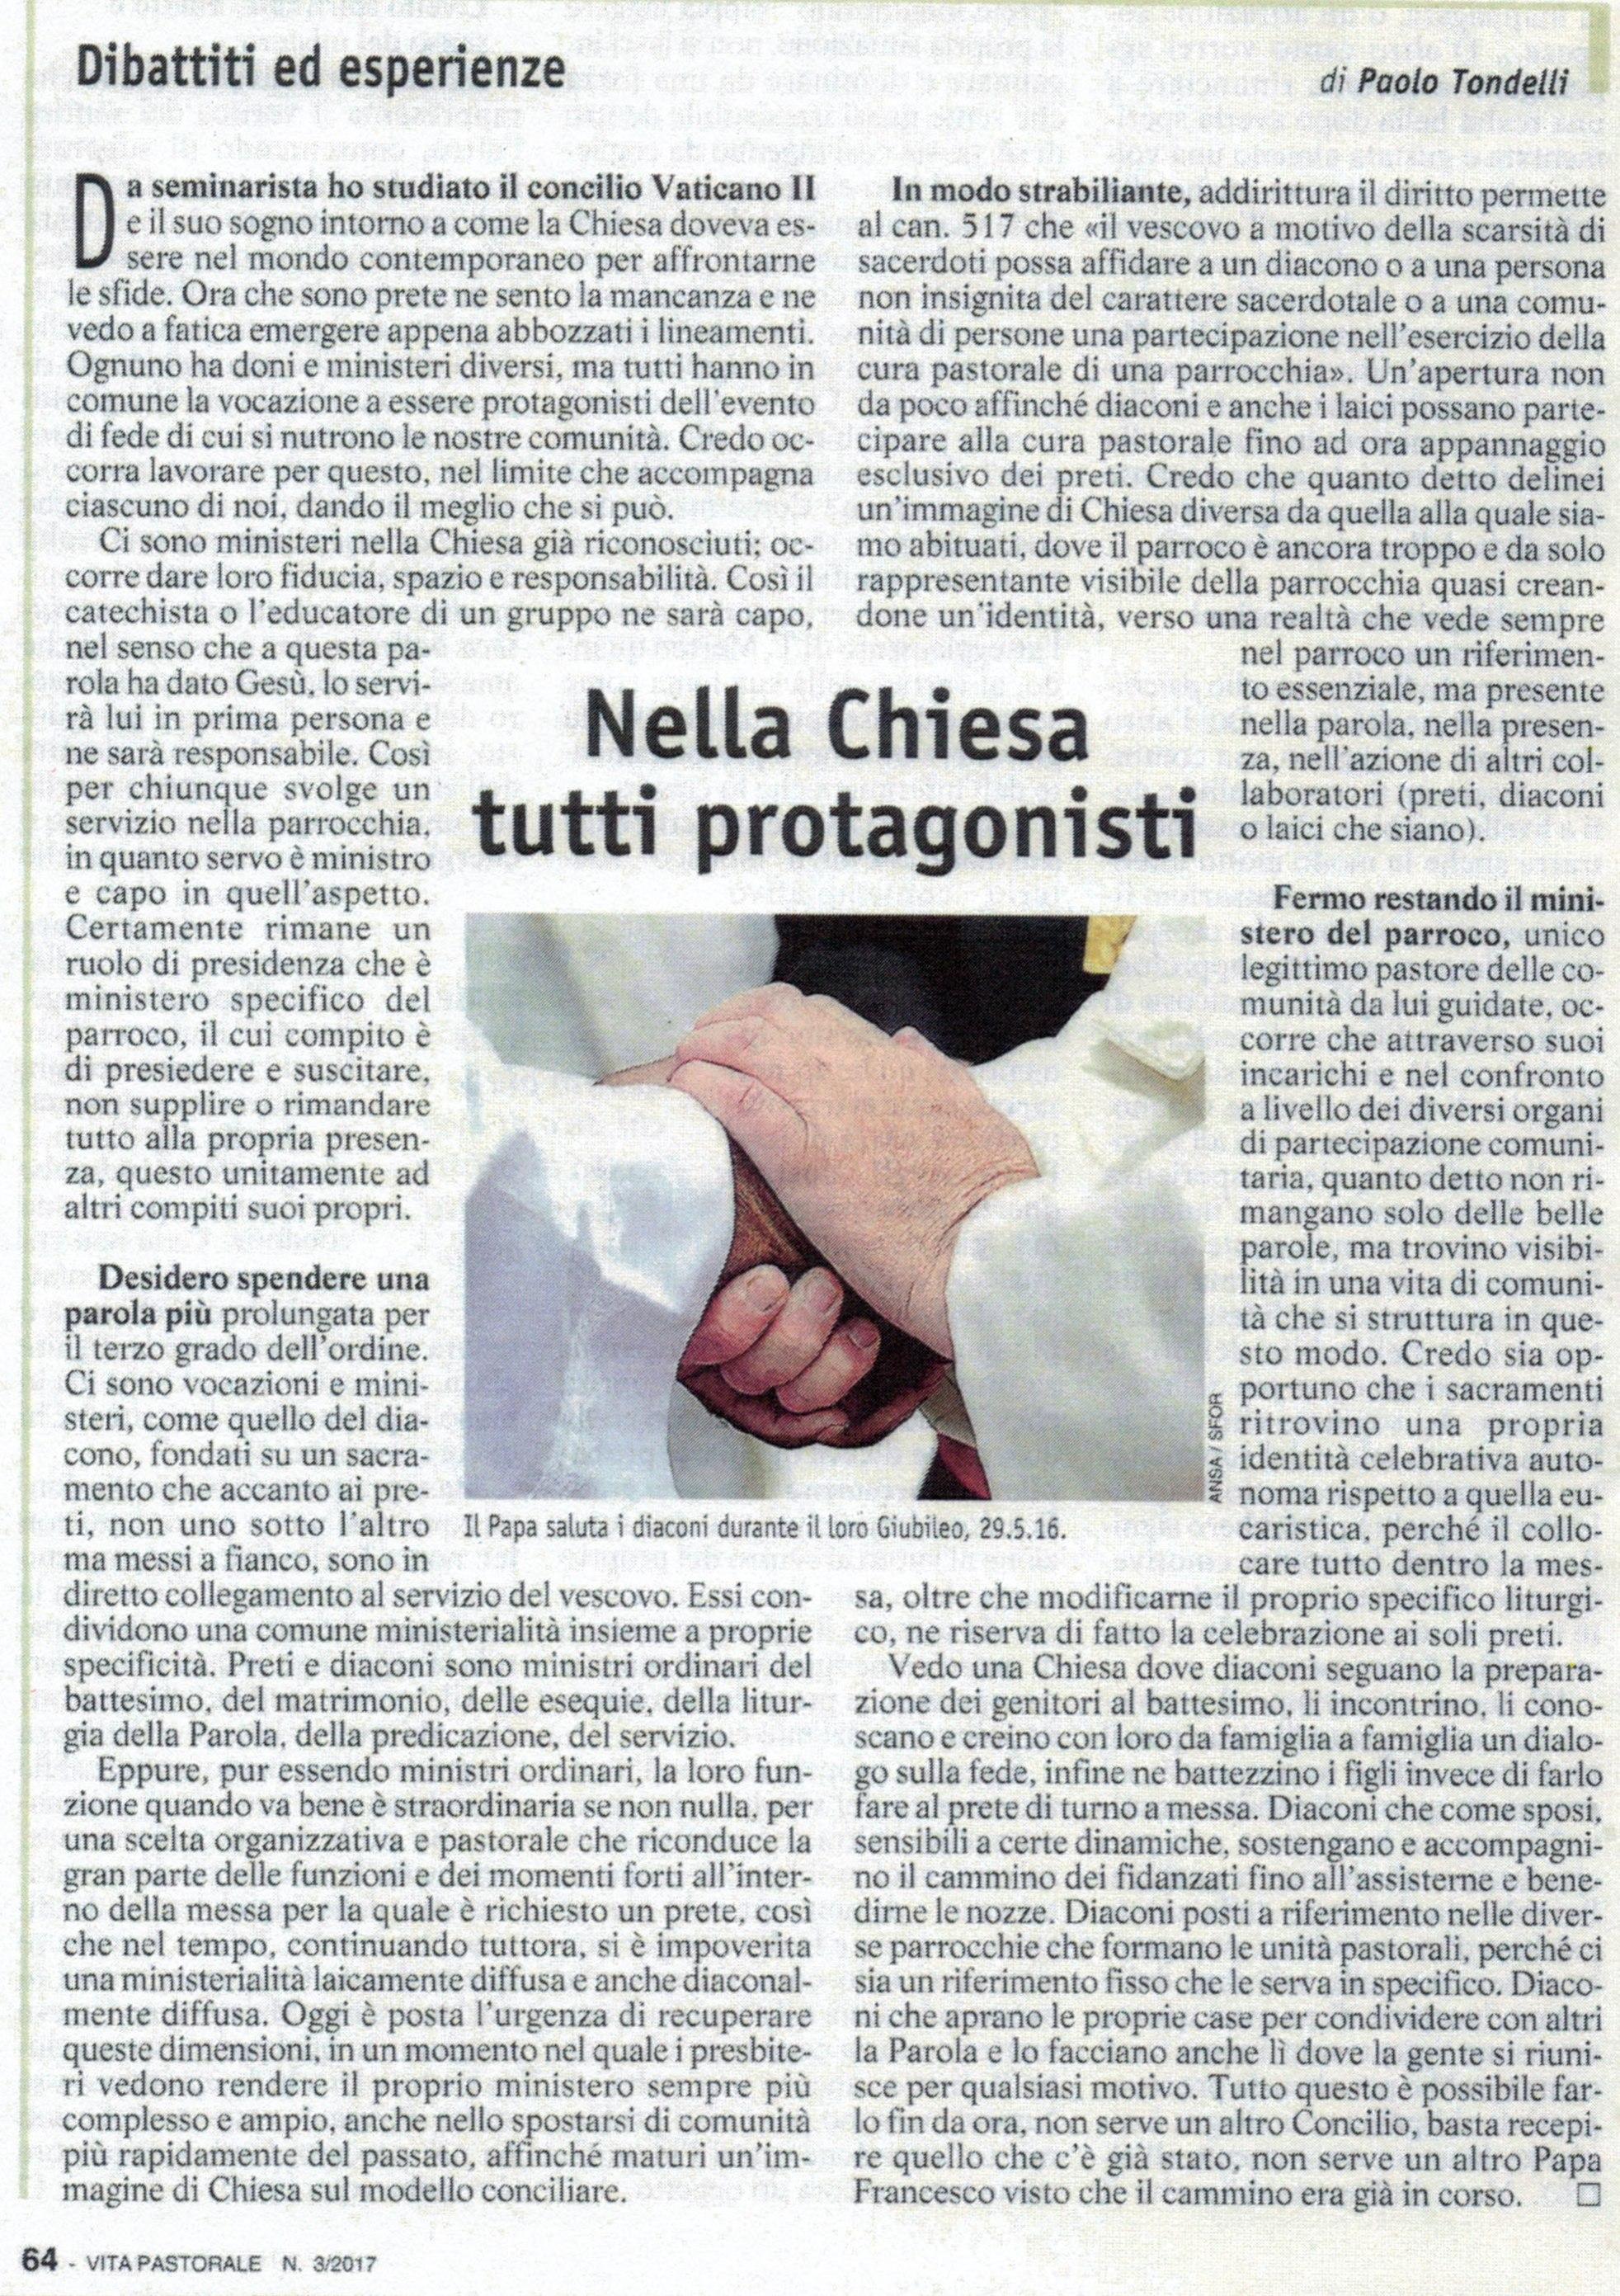 vita-pastorale-3.2017